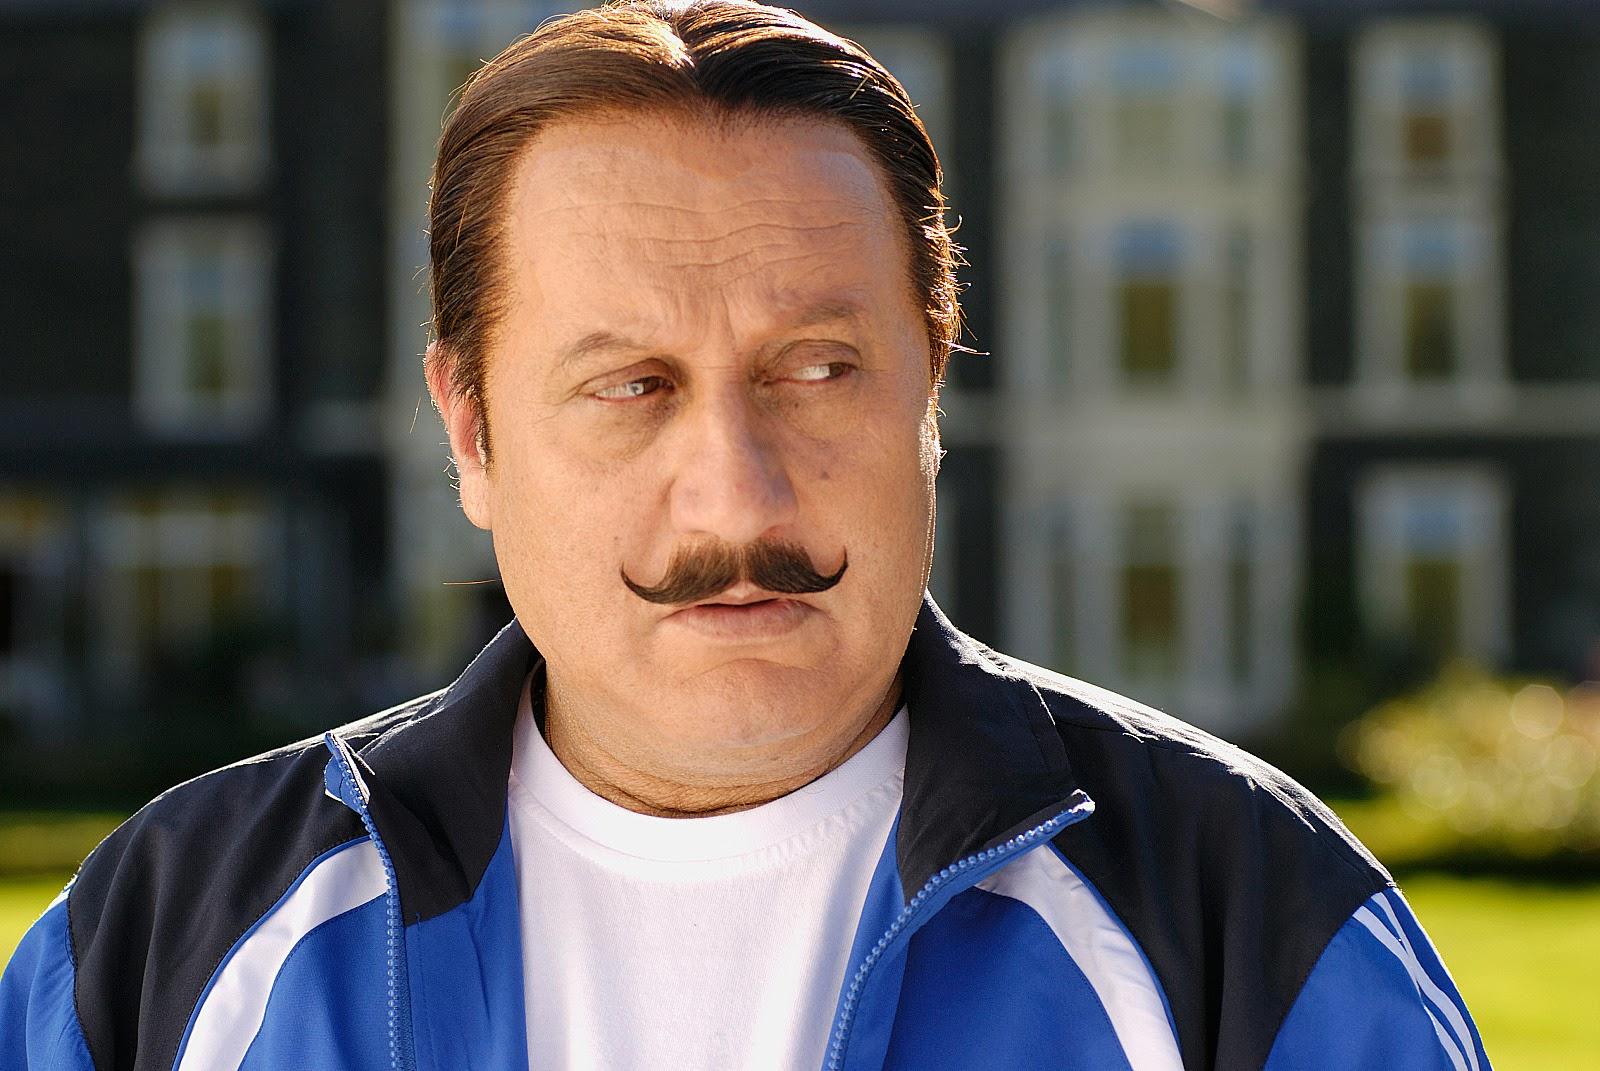 gautam berry actor - photo #16